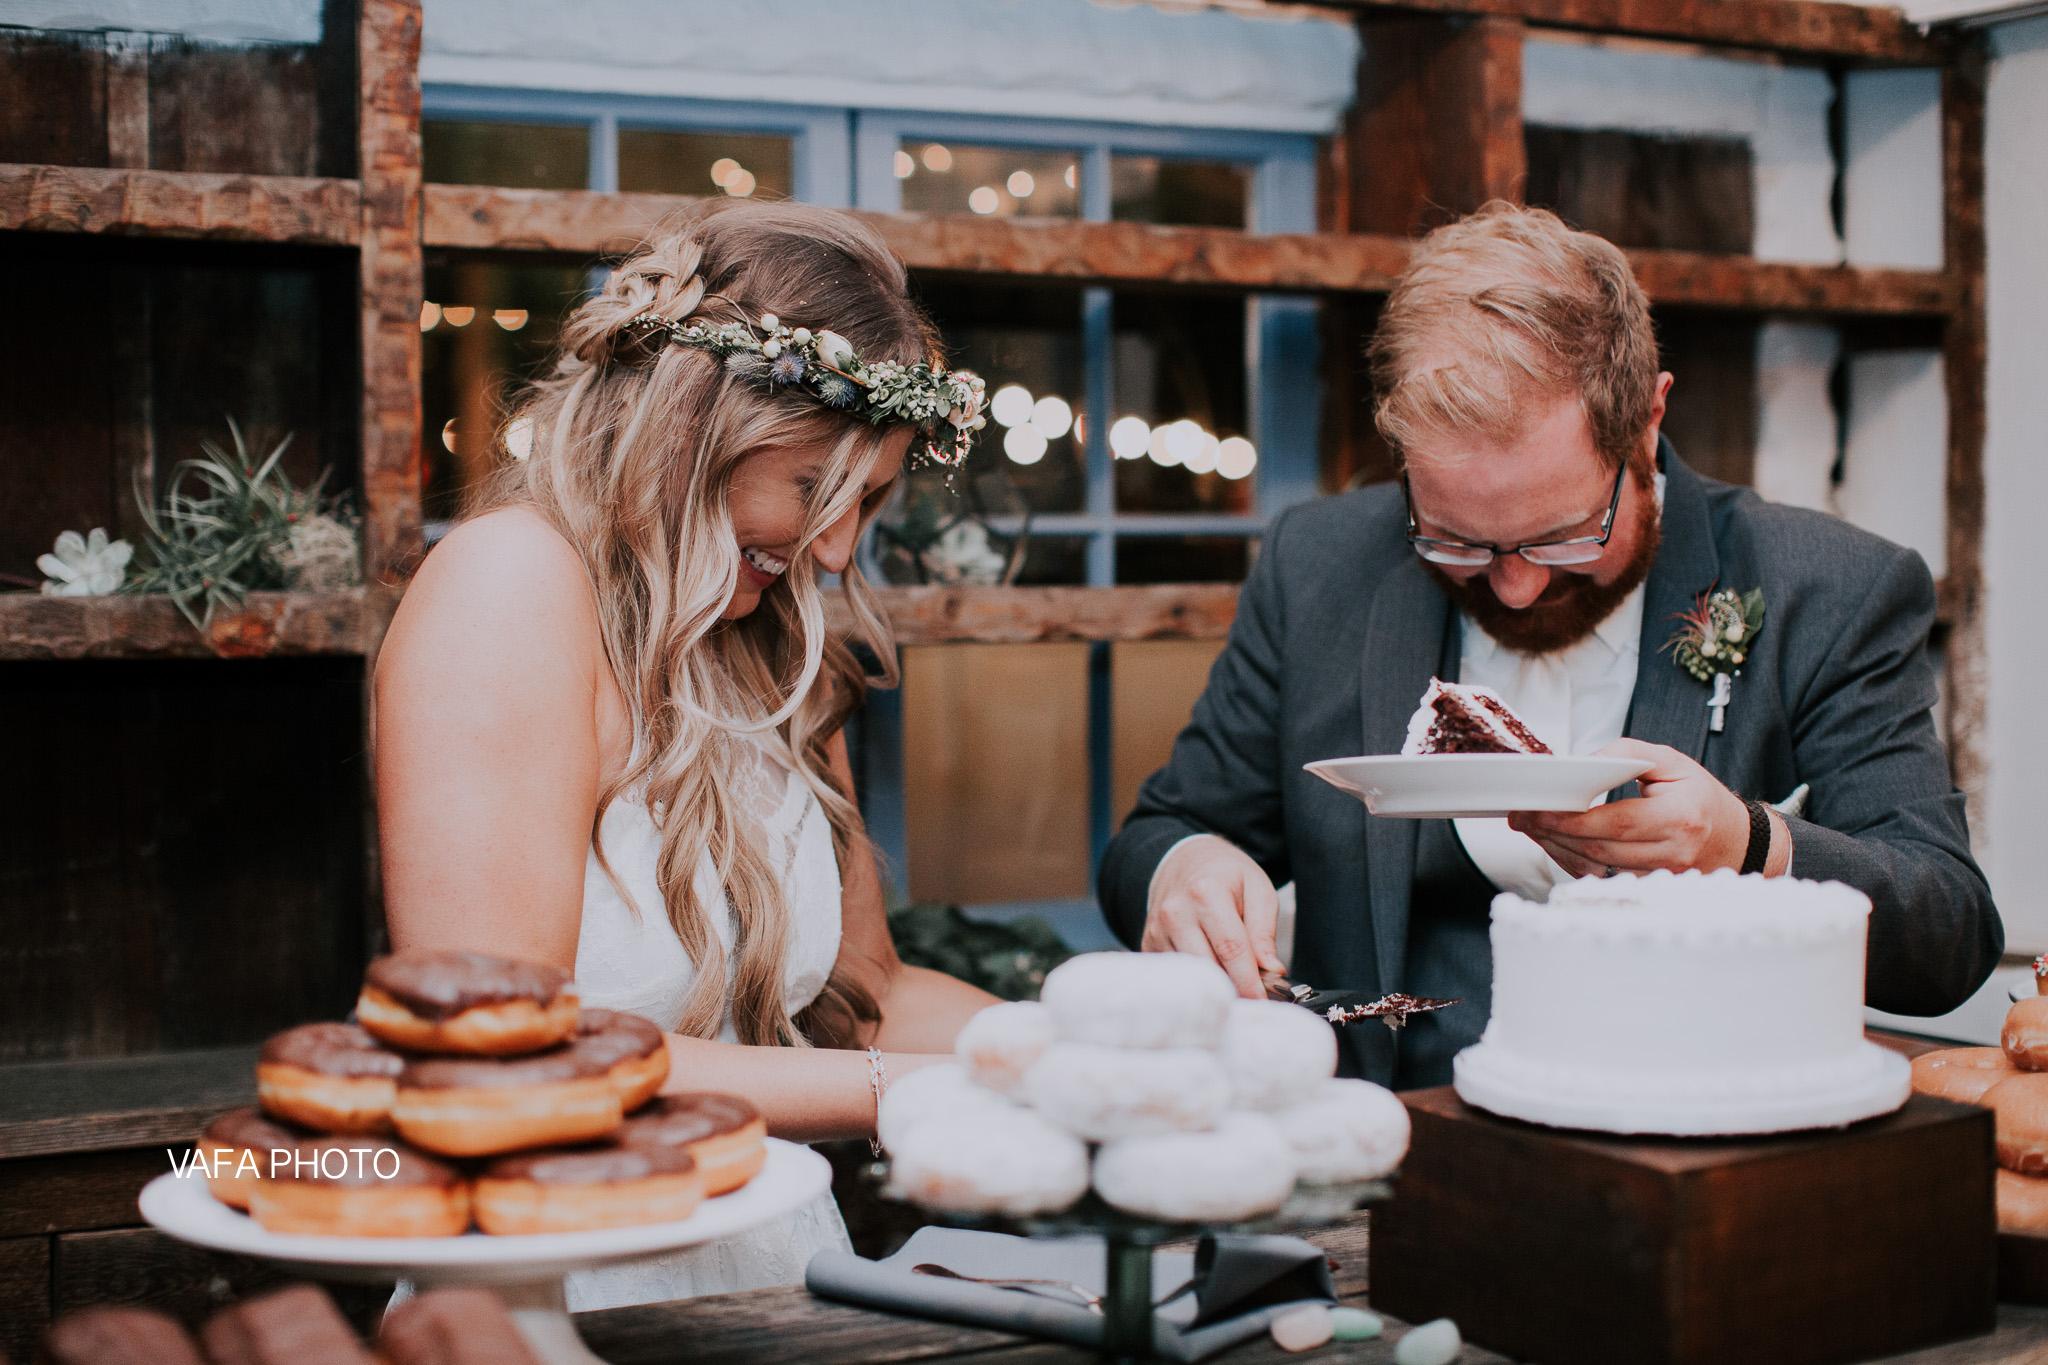 Leo-Carrillo-Ranch-Wedding-Lauren-Mike-Vafa-Photo-1144.jpg